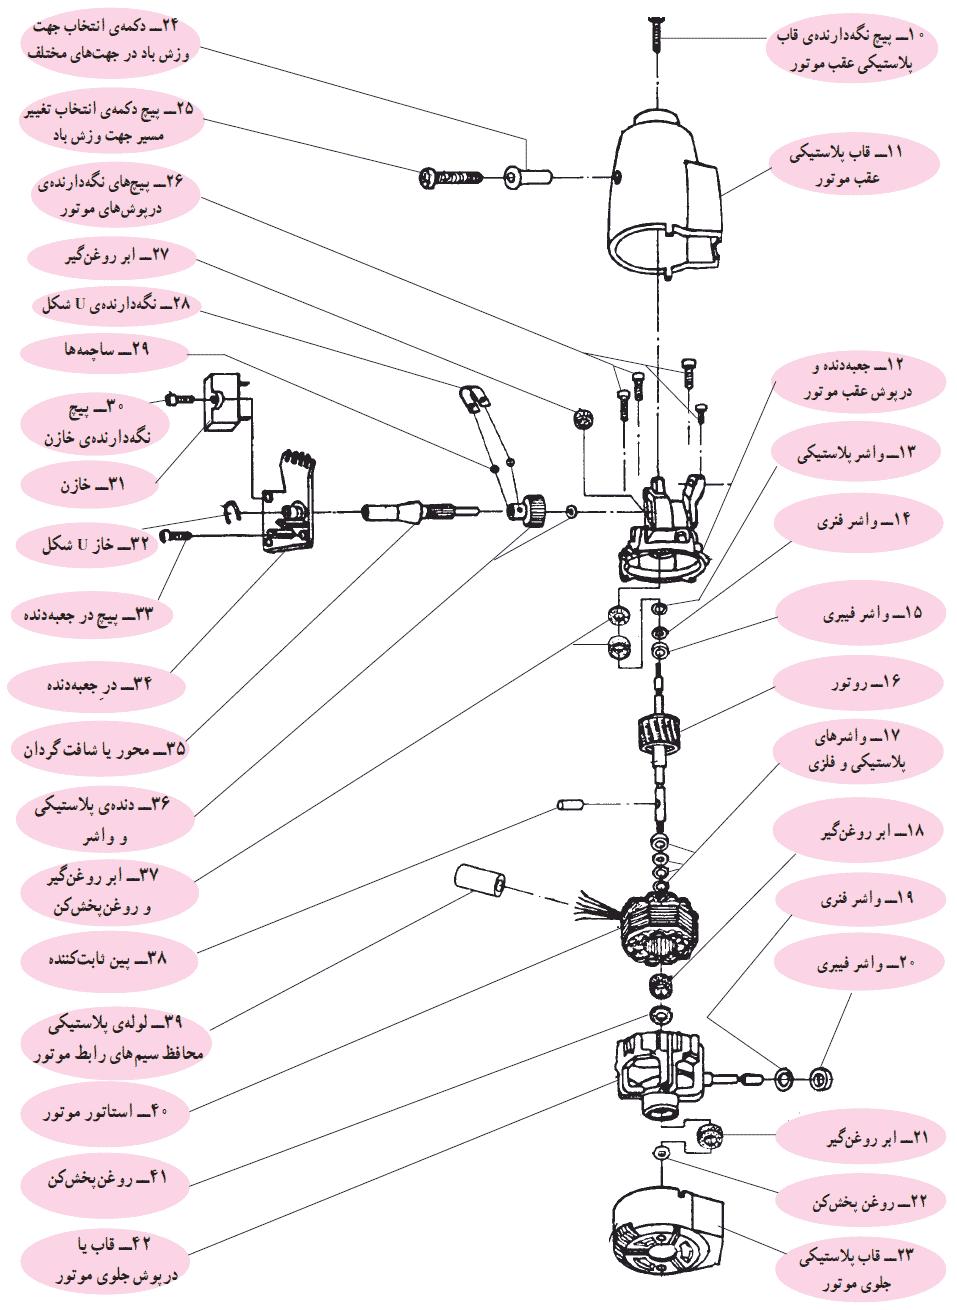 نقشه انفجاری پنکه رومیزی